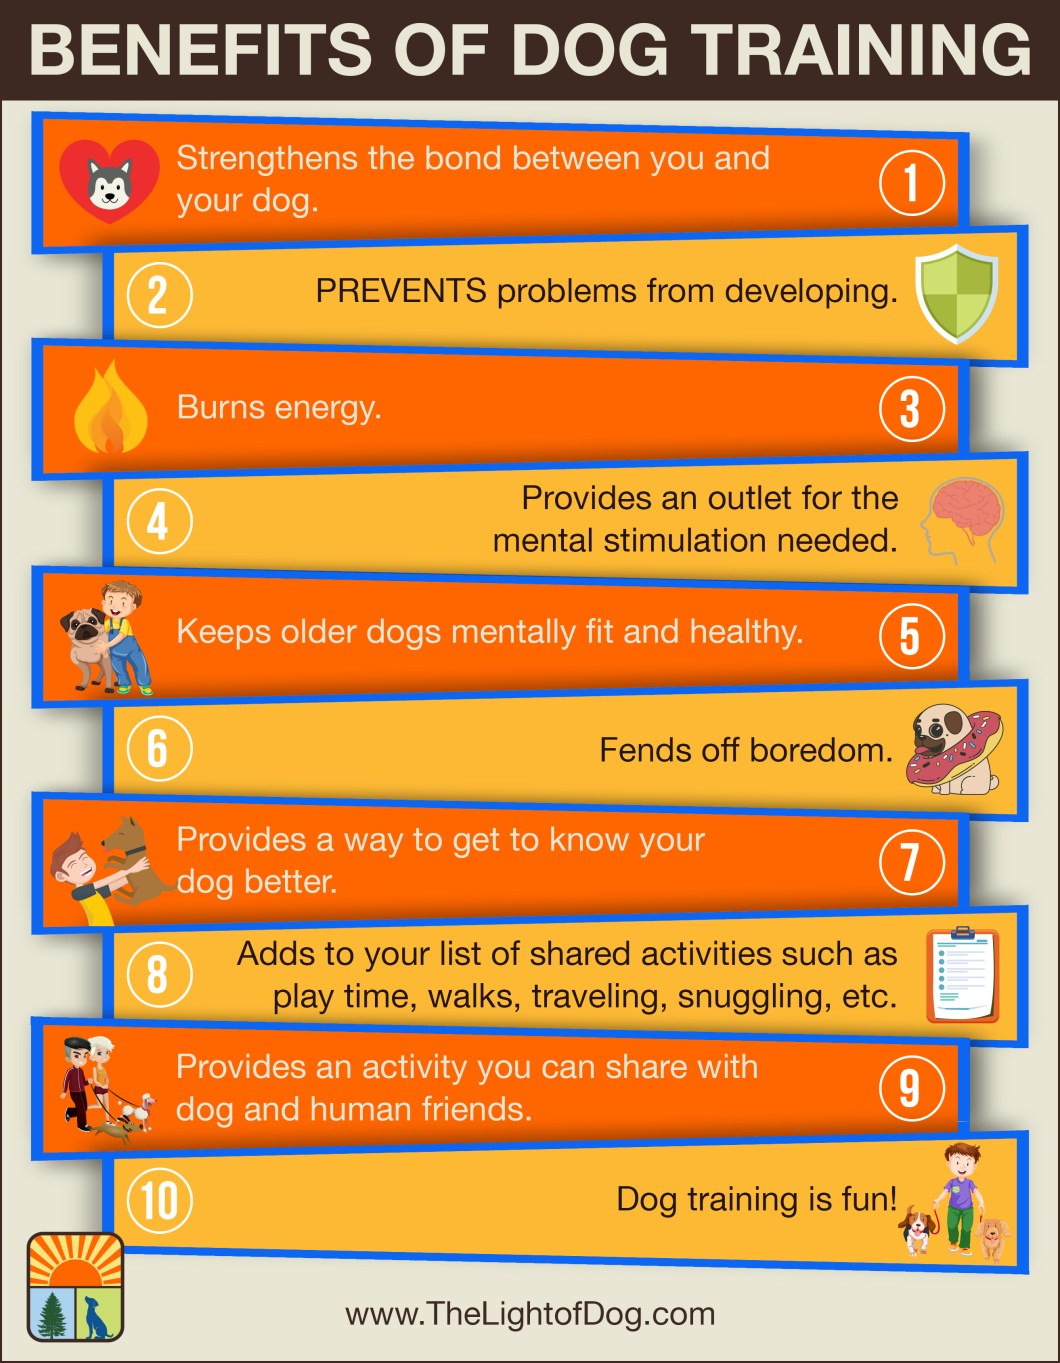 Benefits of training your dog